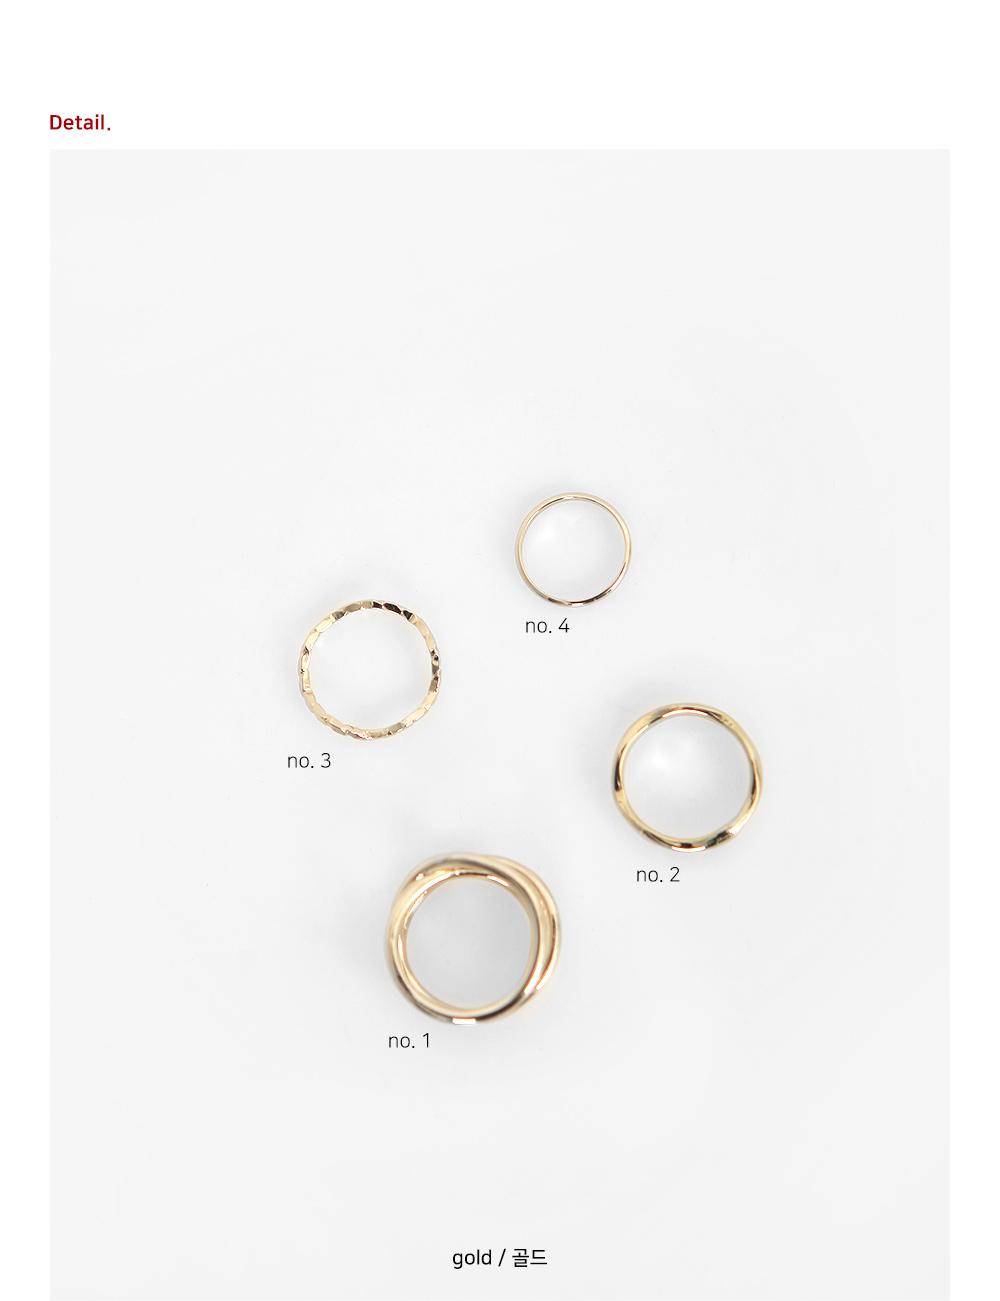 Simple twist set ring